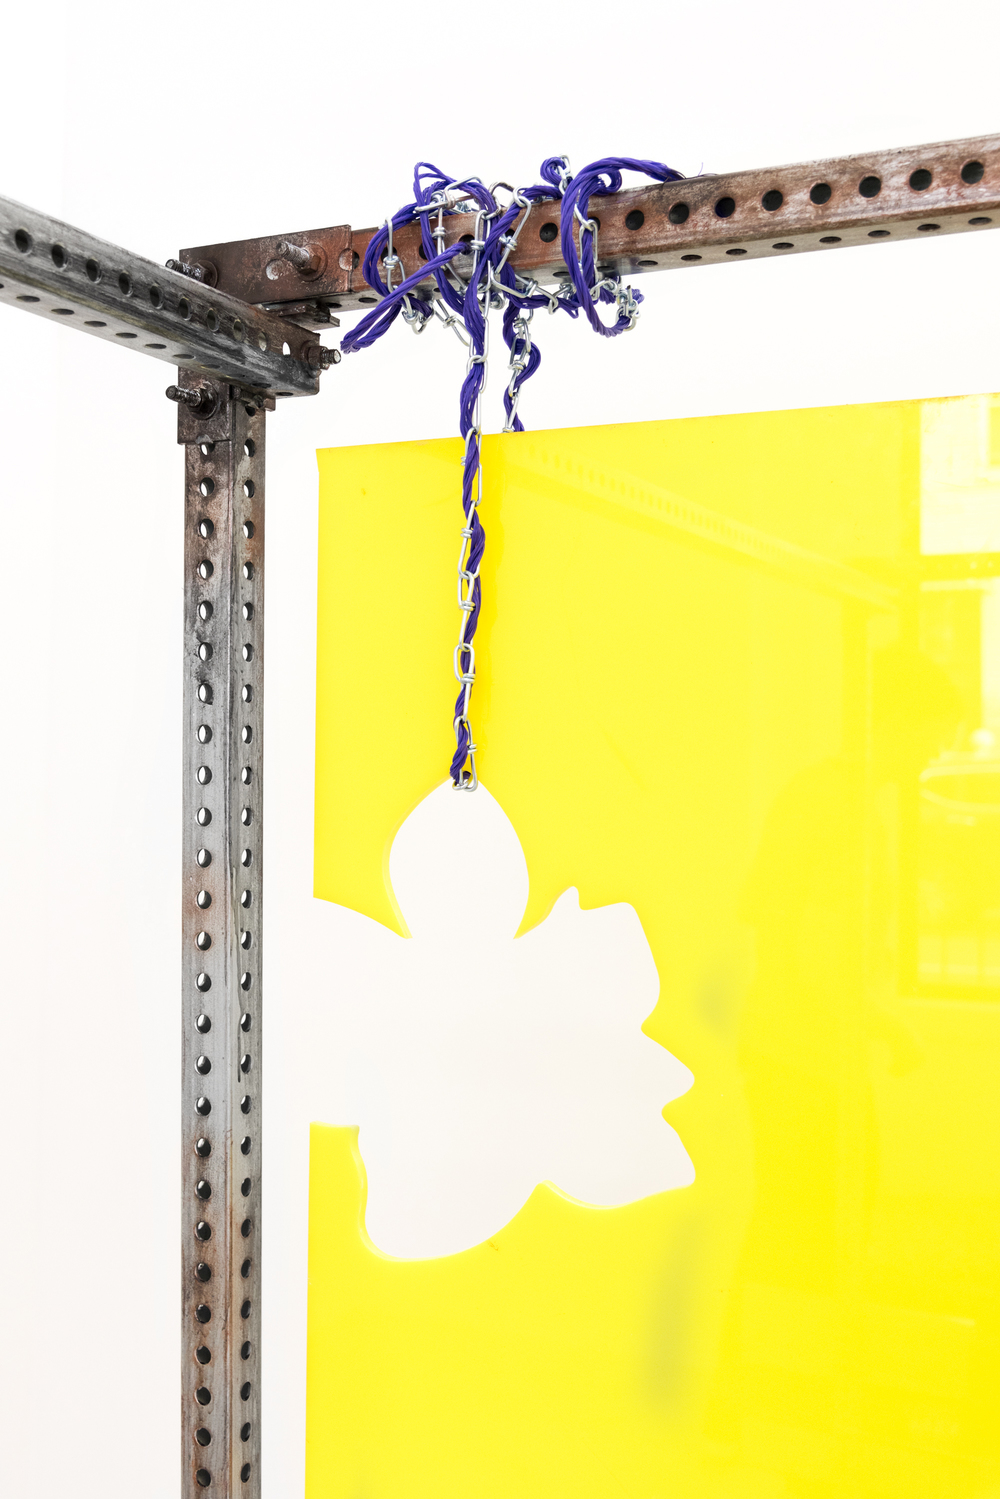 Installation shot from Dusty Contessa Finds a Homestead @Kimberly Klark